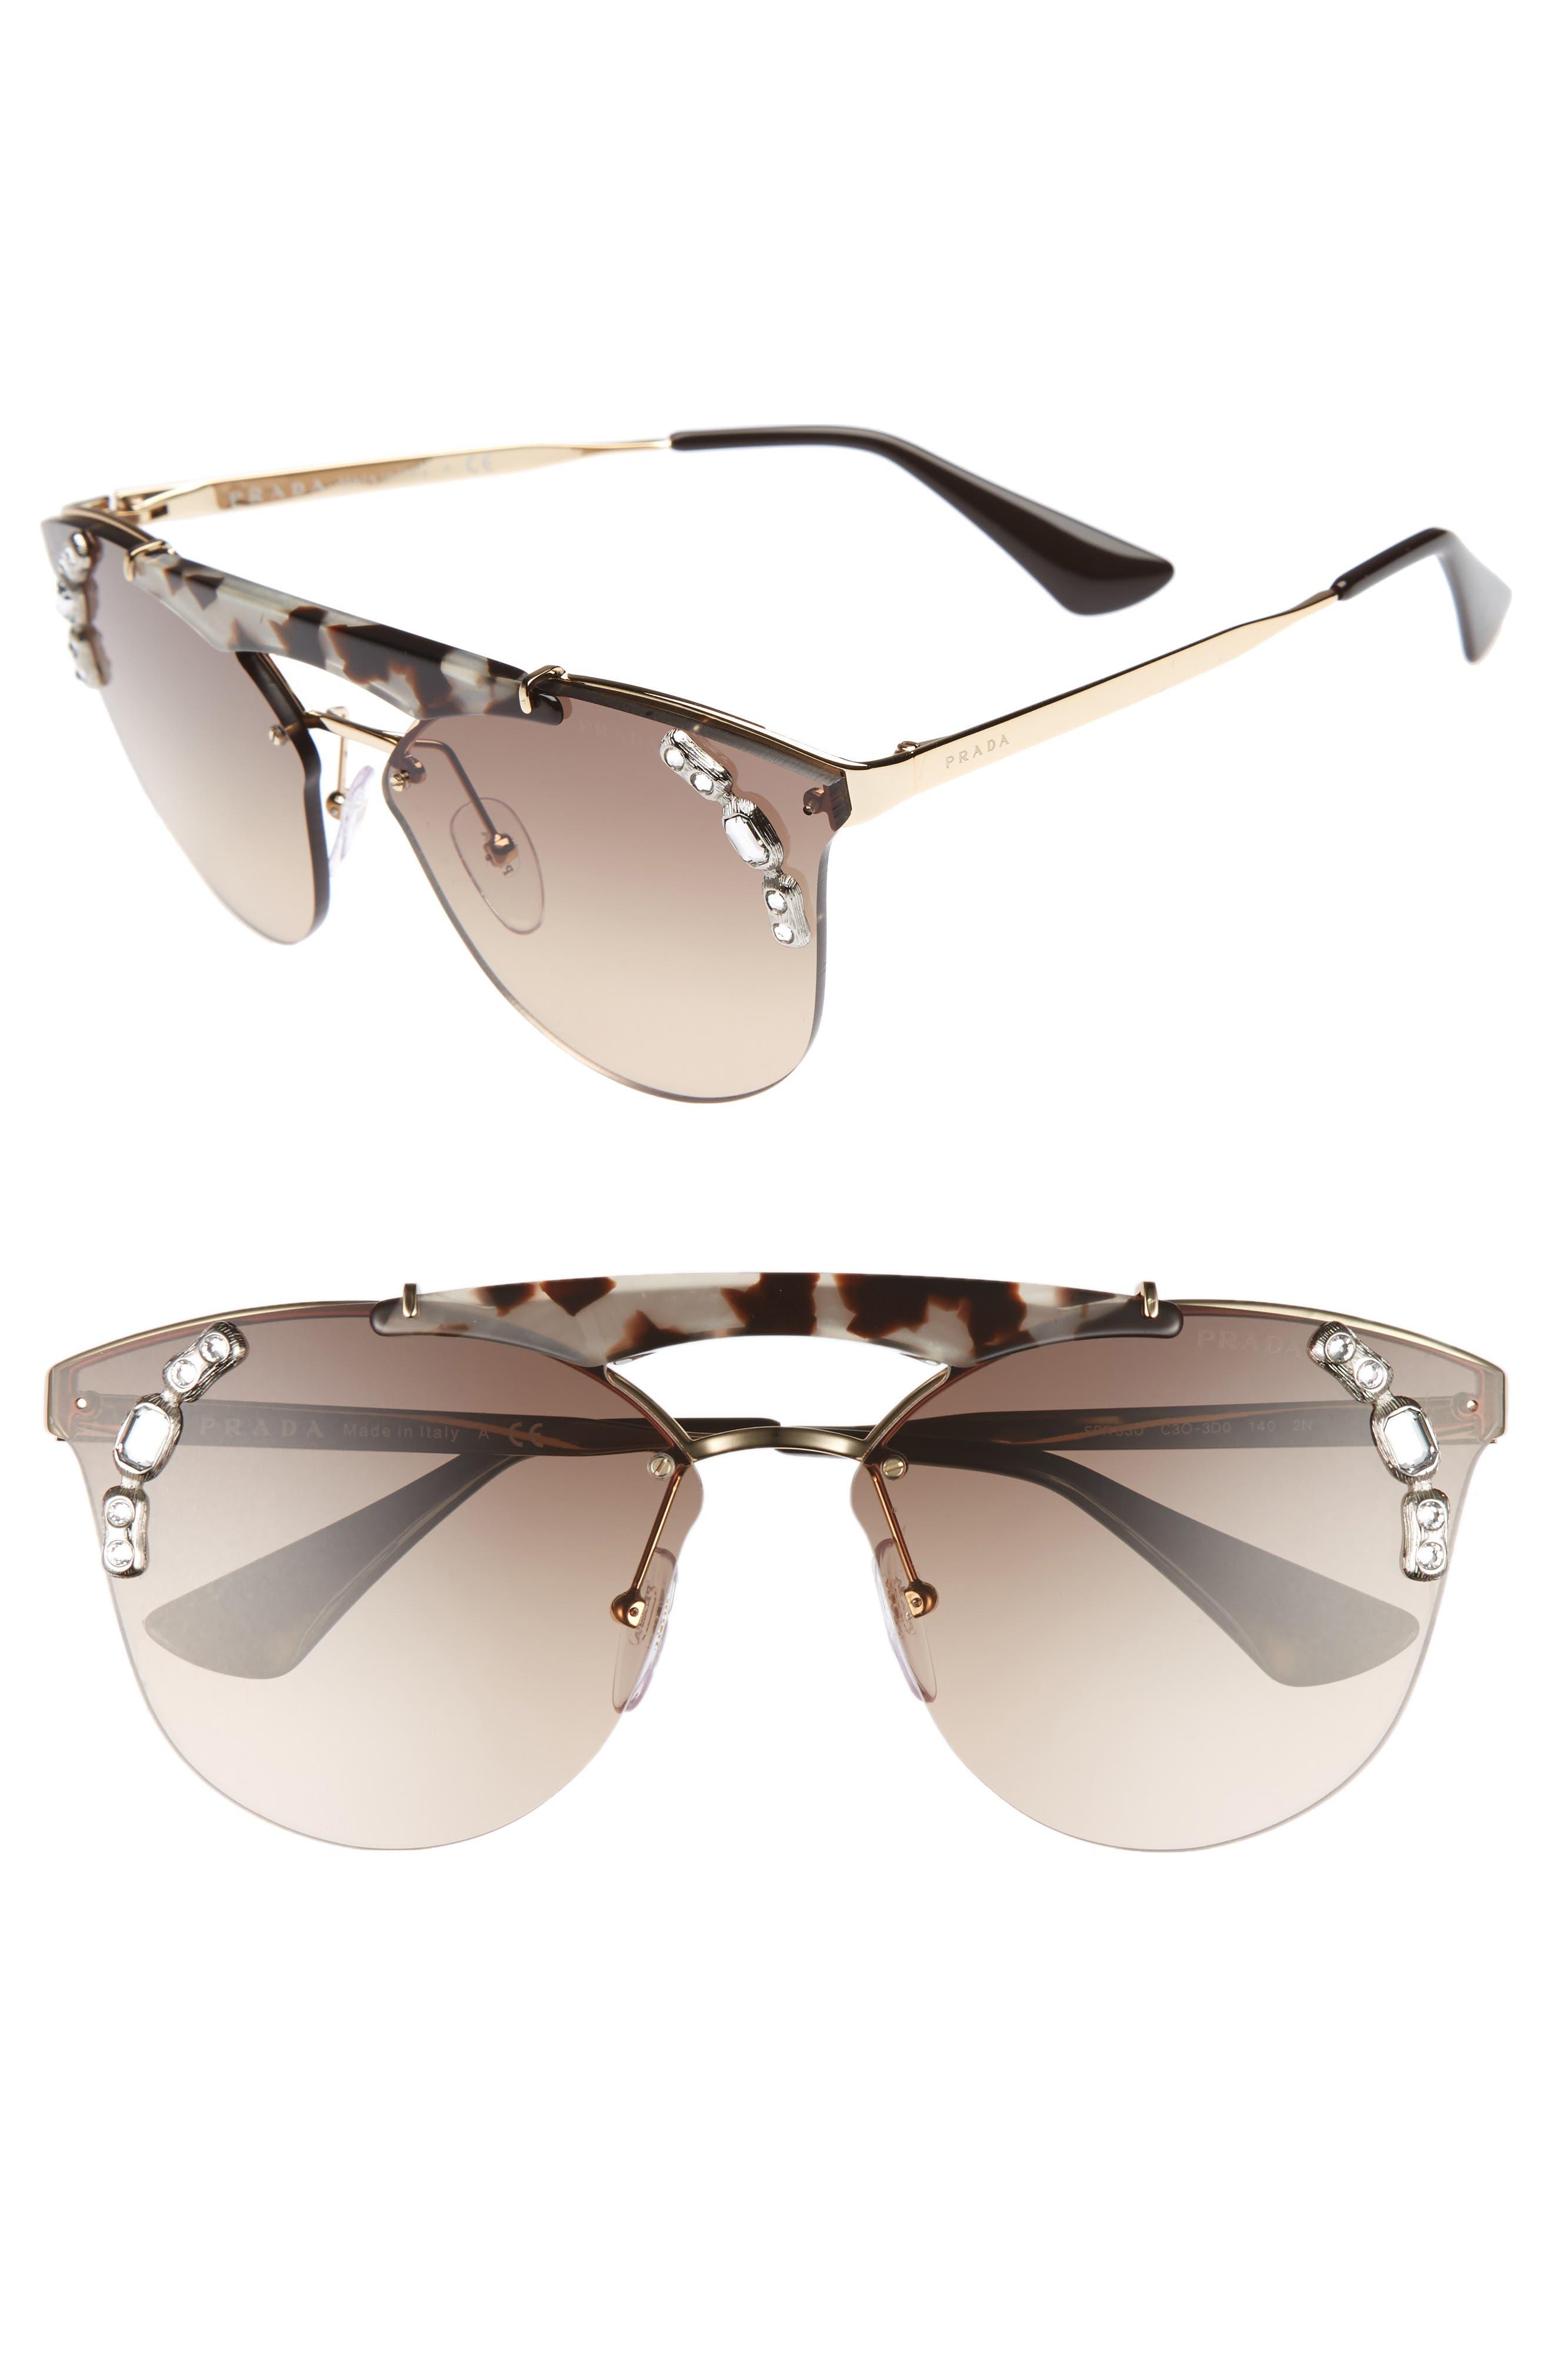 Main Image - Prada 53mm Embellished Rimless Sunglasses